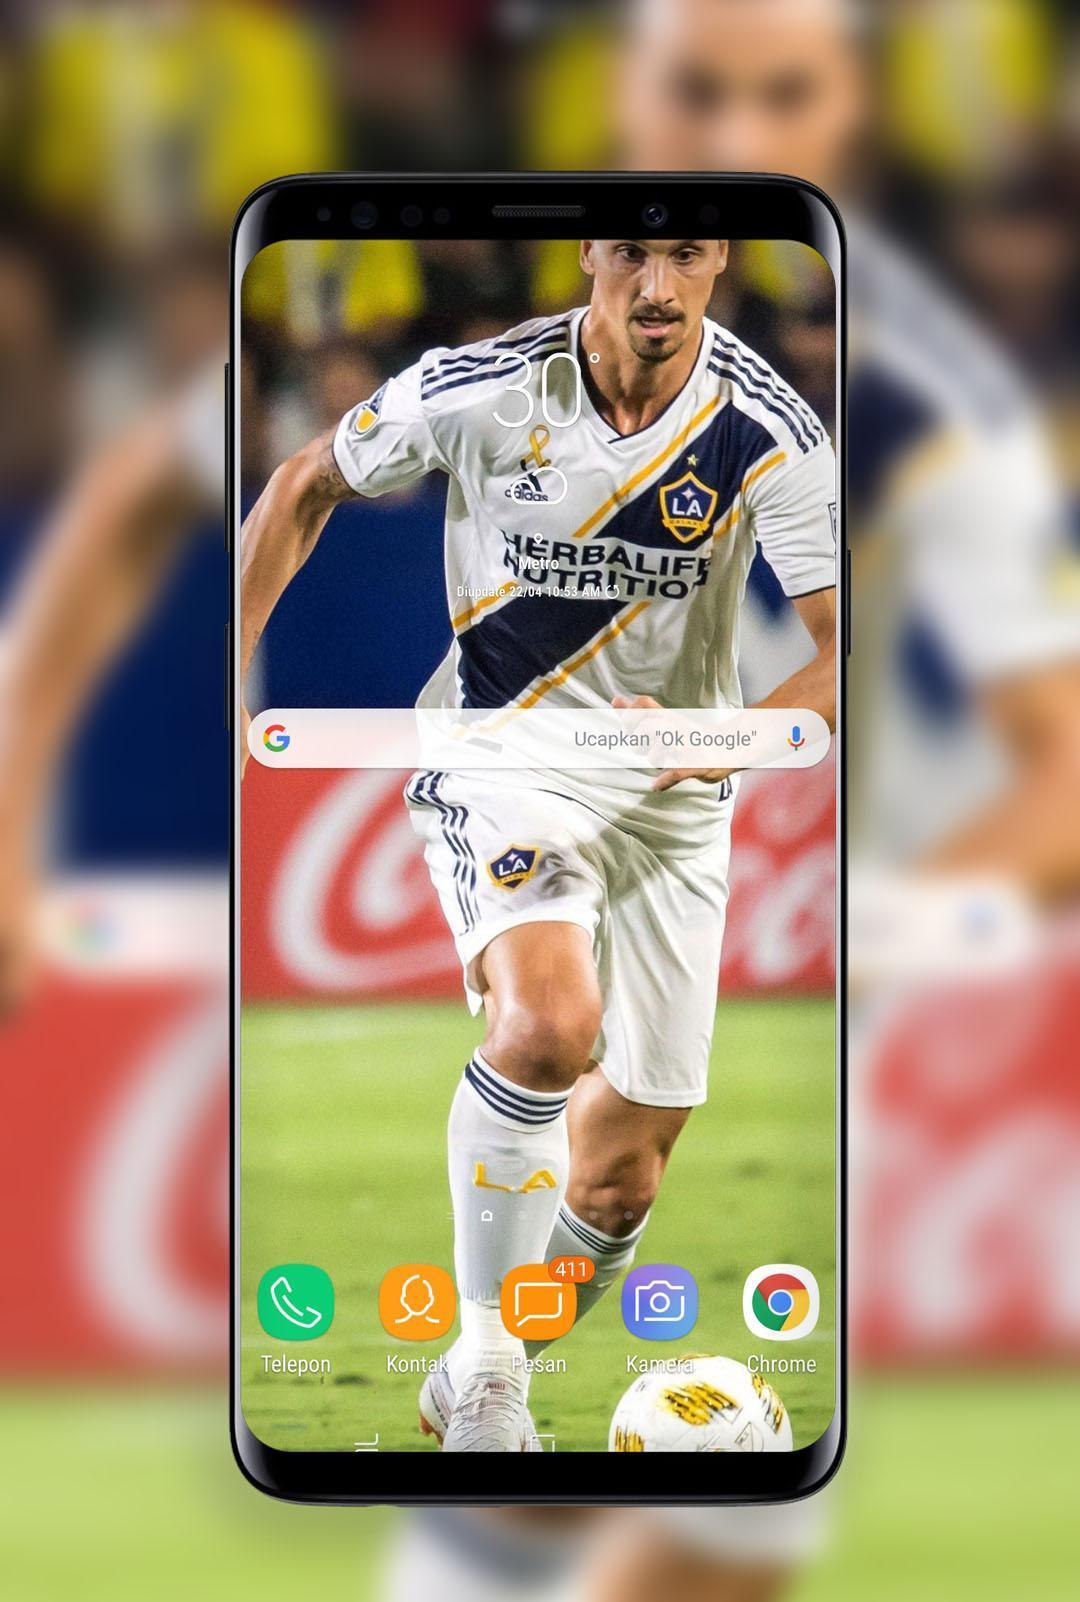 Zlatan Ibrahimovic Wallpaper Hd 4k For Android Apk Download